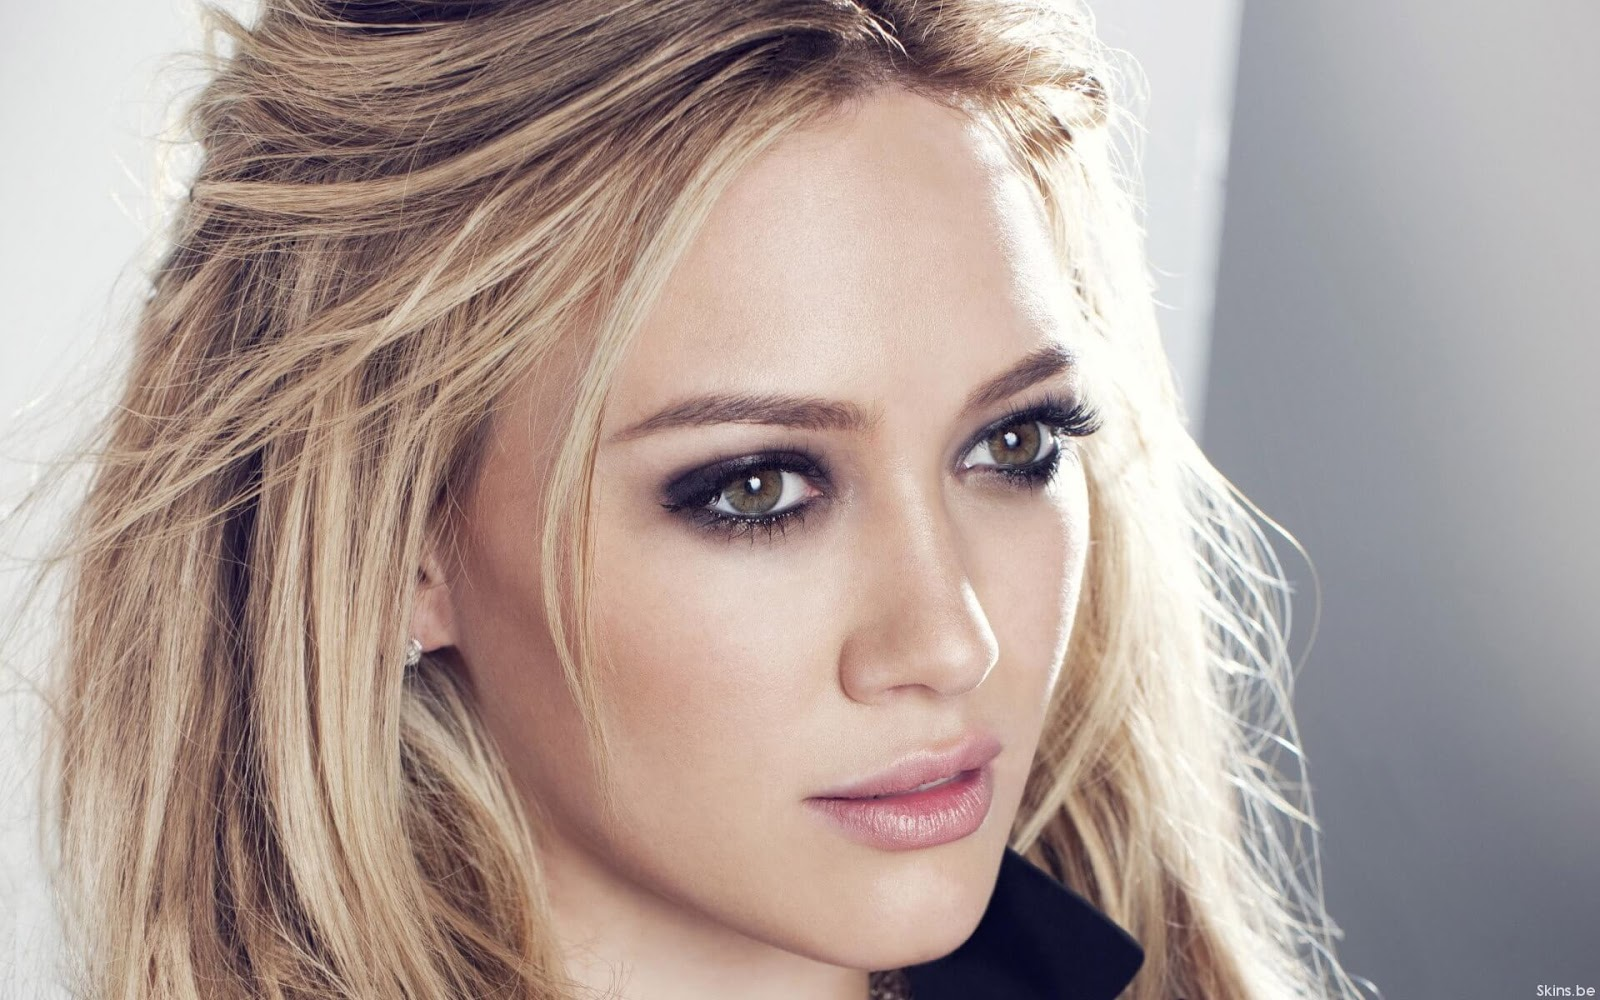 Hilary Duff defiende a Selena Gomez